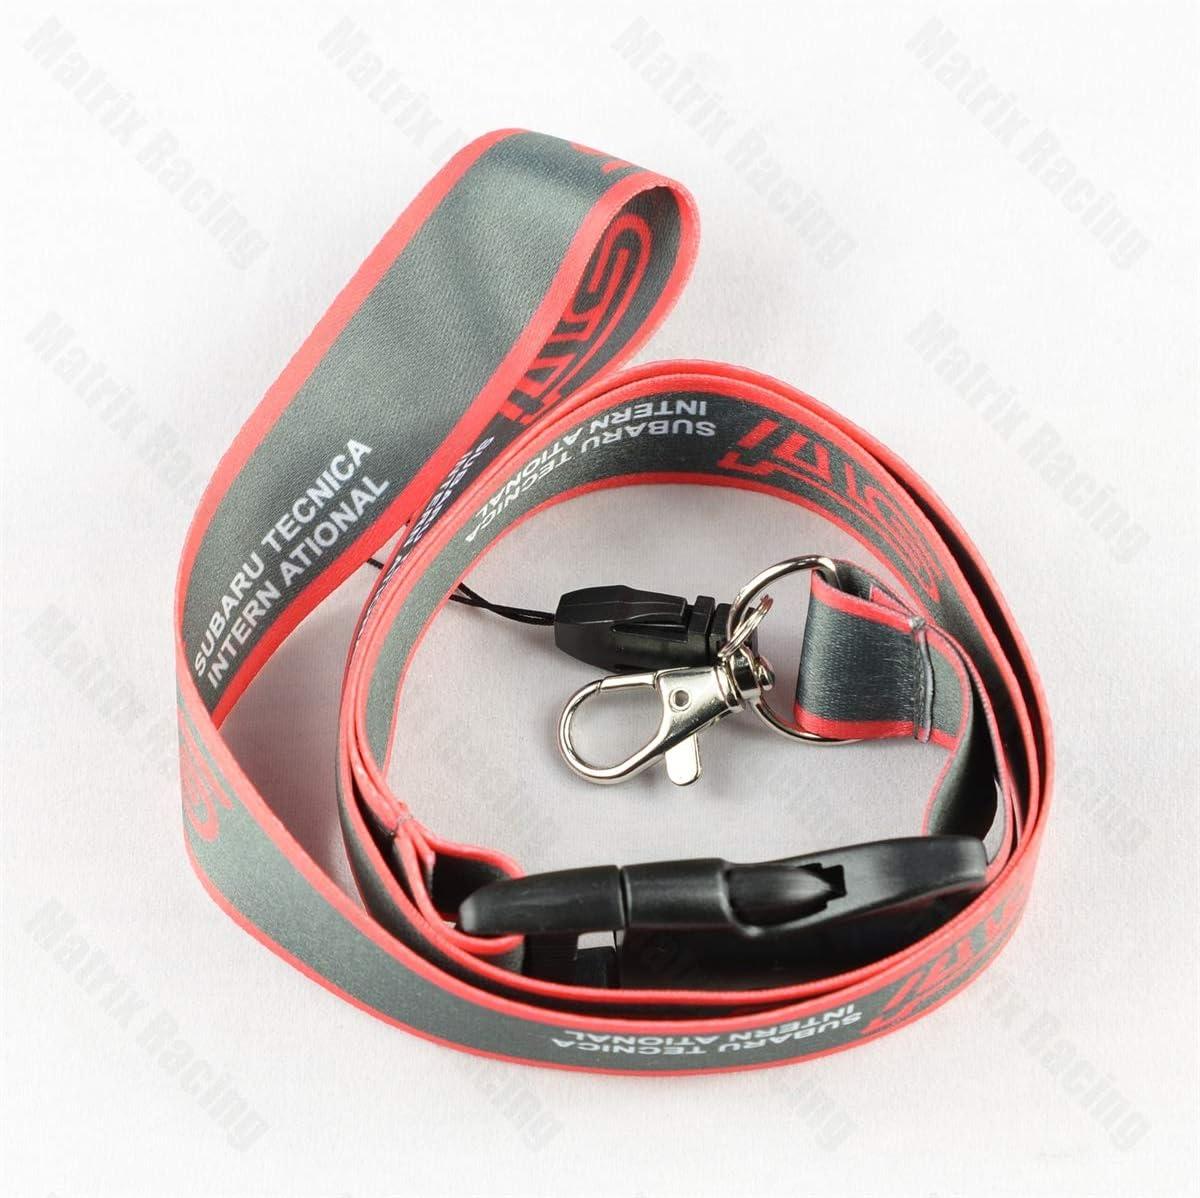 Gray JDM Style for STI Lanyard Racing Car Keychain ID Card Badge Holder Neck Strap for Subaru WRX Impreza Forester Outback BRZ Legacy Ascent Crosstrek